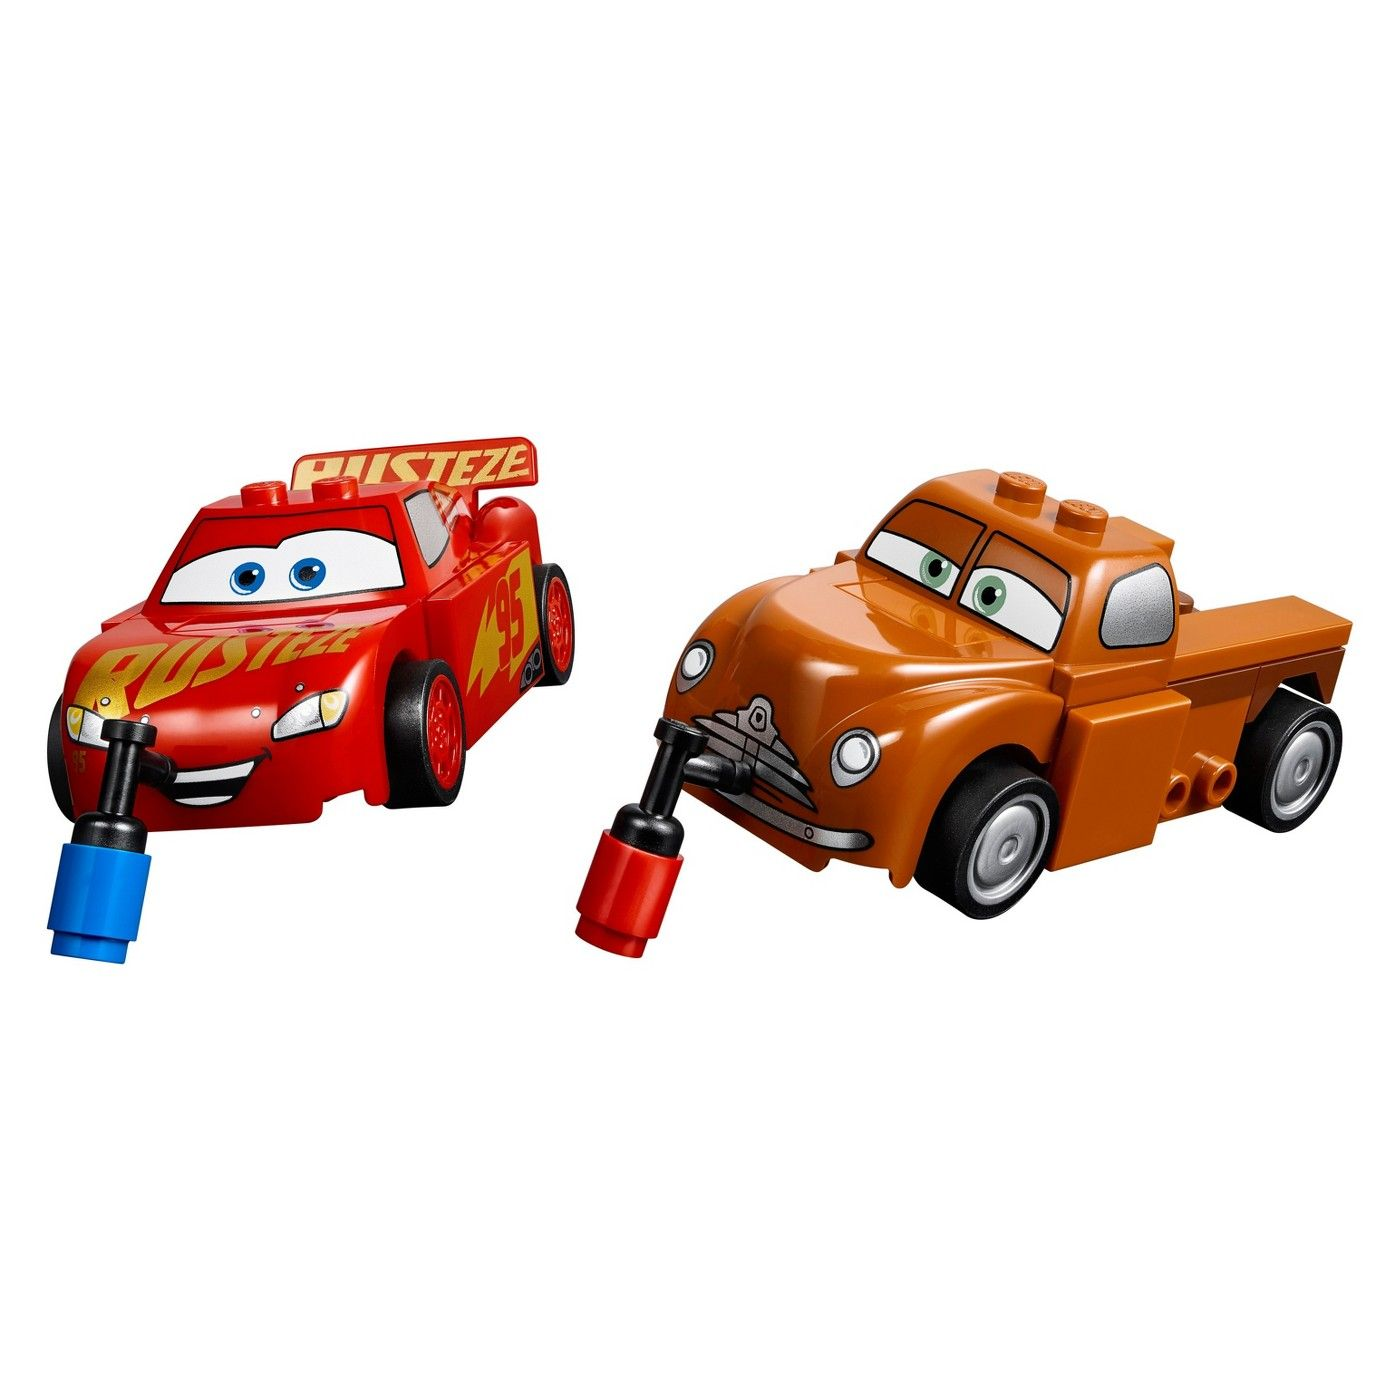 Legoâ Juniors Disneyâpixarâ20cars 3 Smokeys Garage 10743